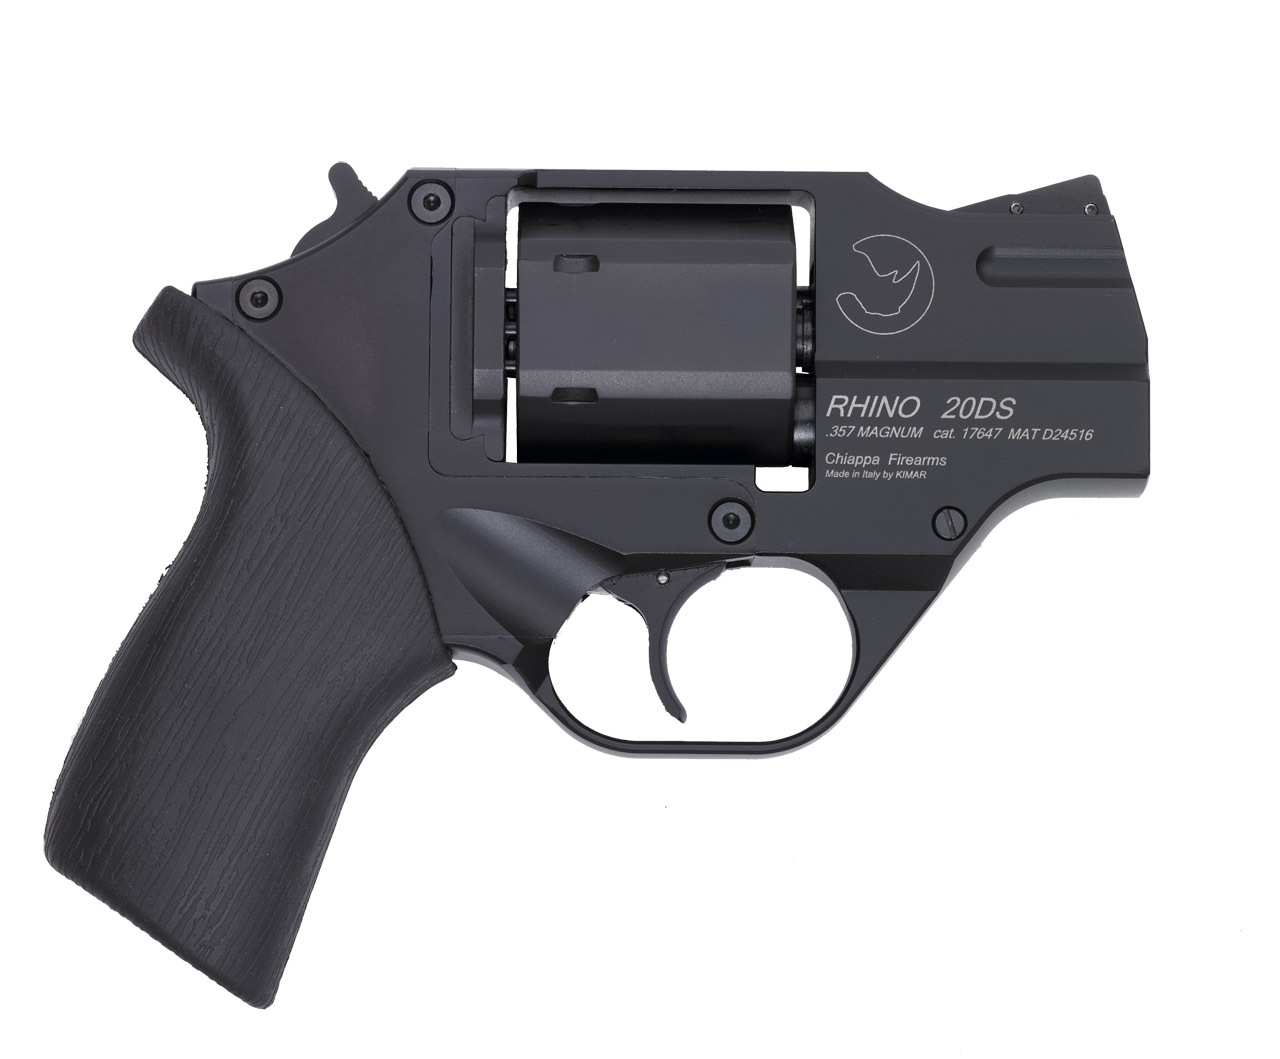 Rhino_Revolver_Black_2-inch_Barrel_Chiappa_Firearms_1